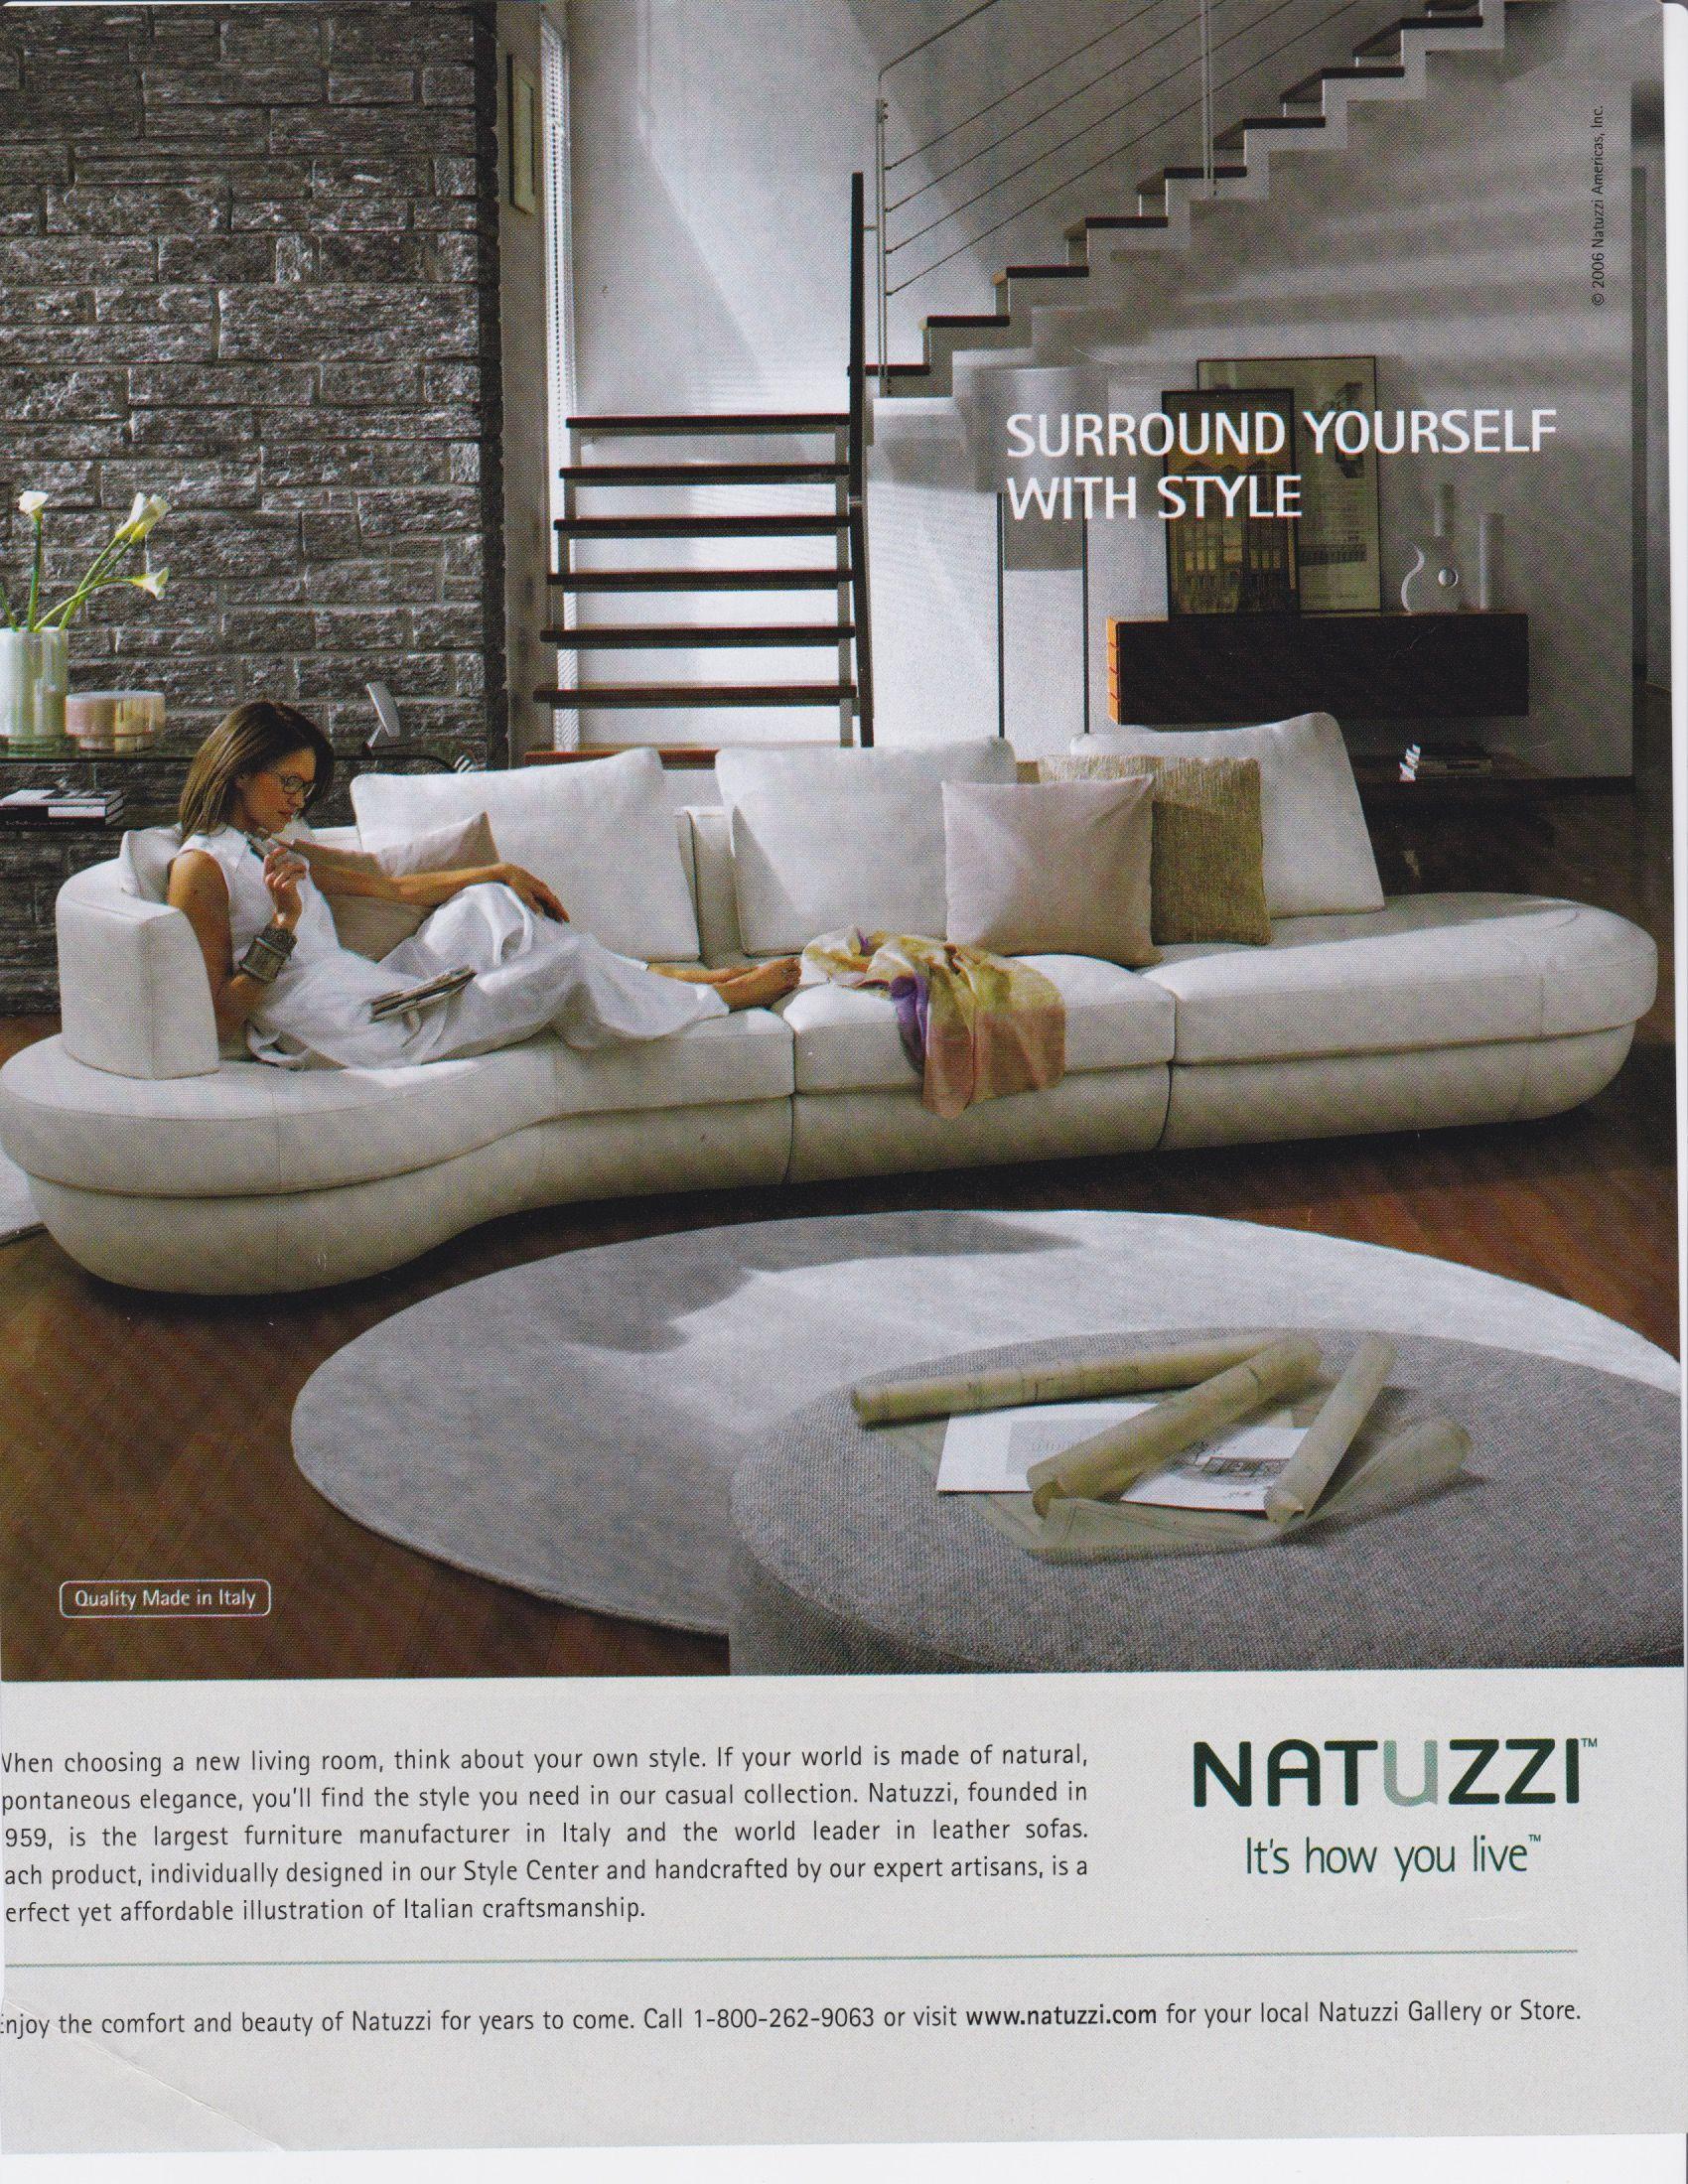 Pin by Annunziata Gianzero on Home Design  House design